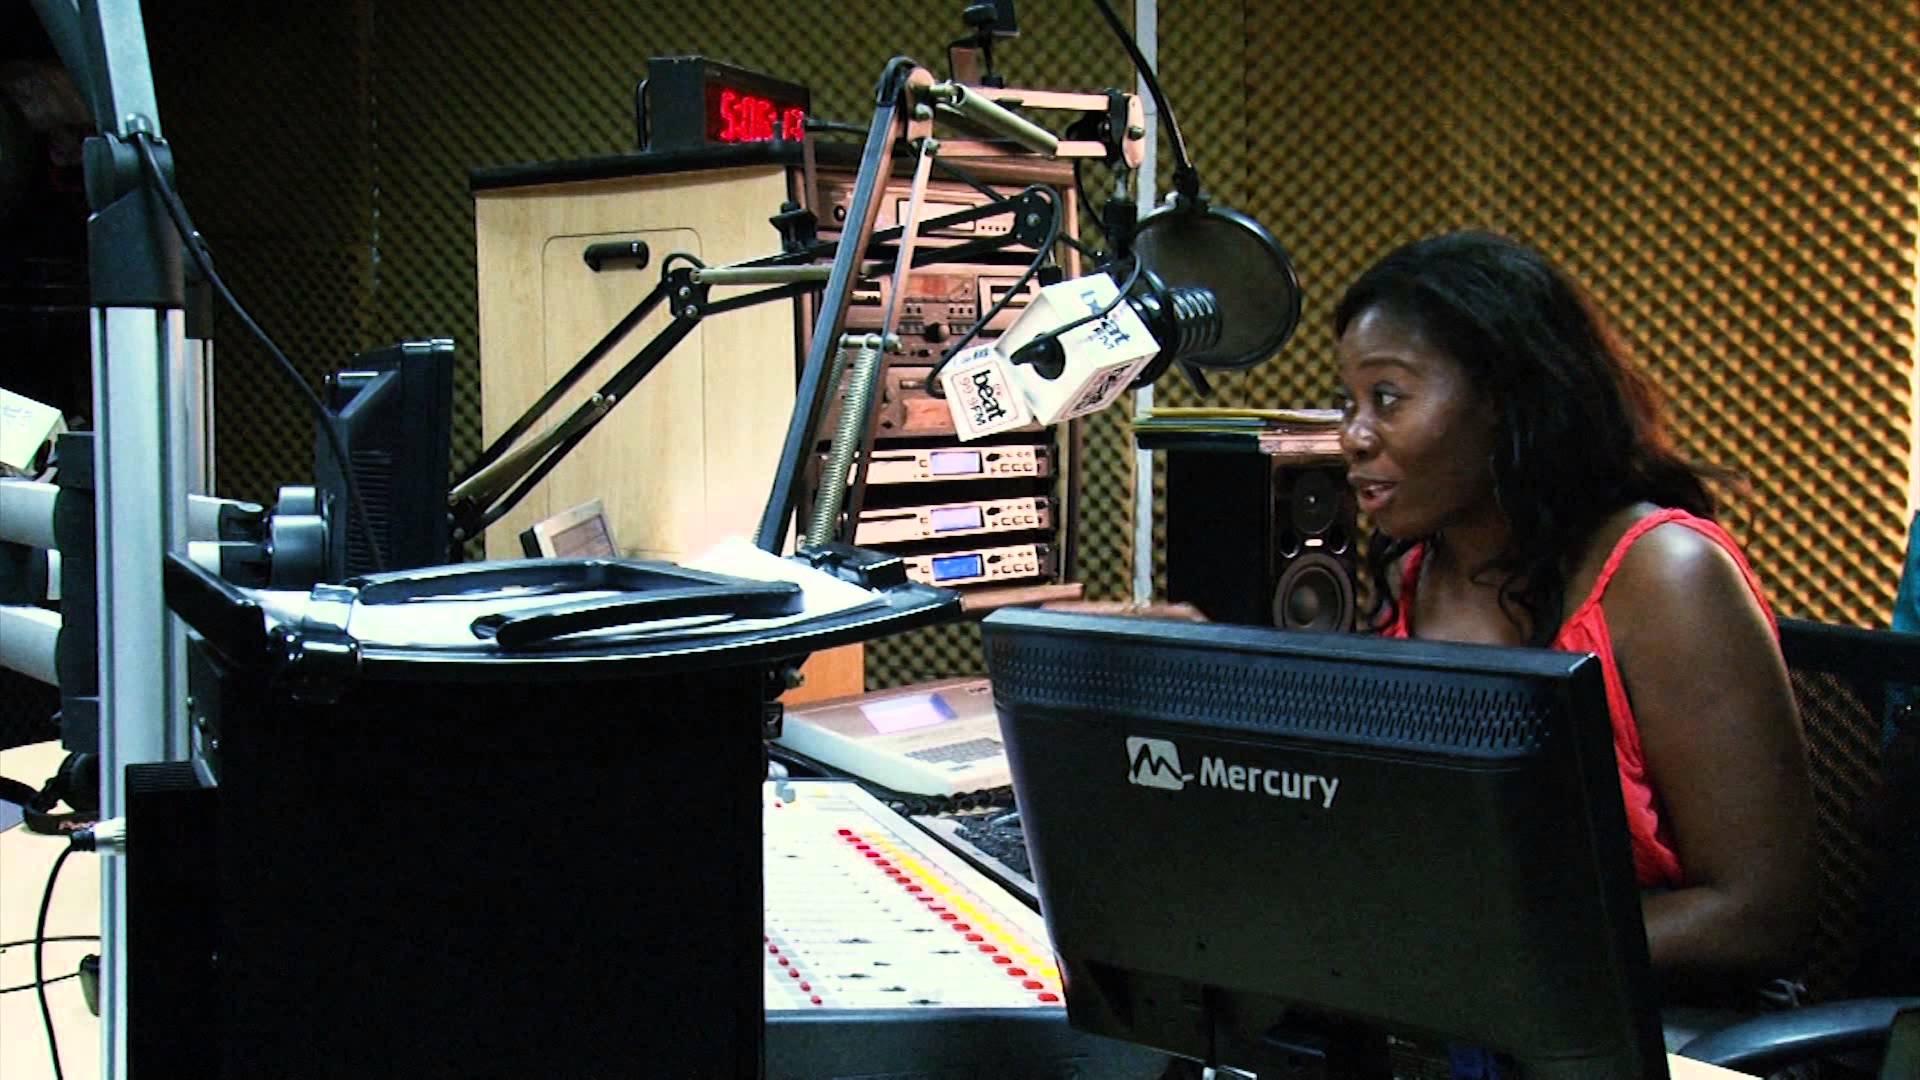 GBEMI OLATERU OLAGBEGI ON THE BEAT99.9FM SHARING DO'S AND DON'TS, HOW RADIO WORKS